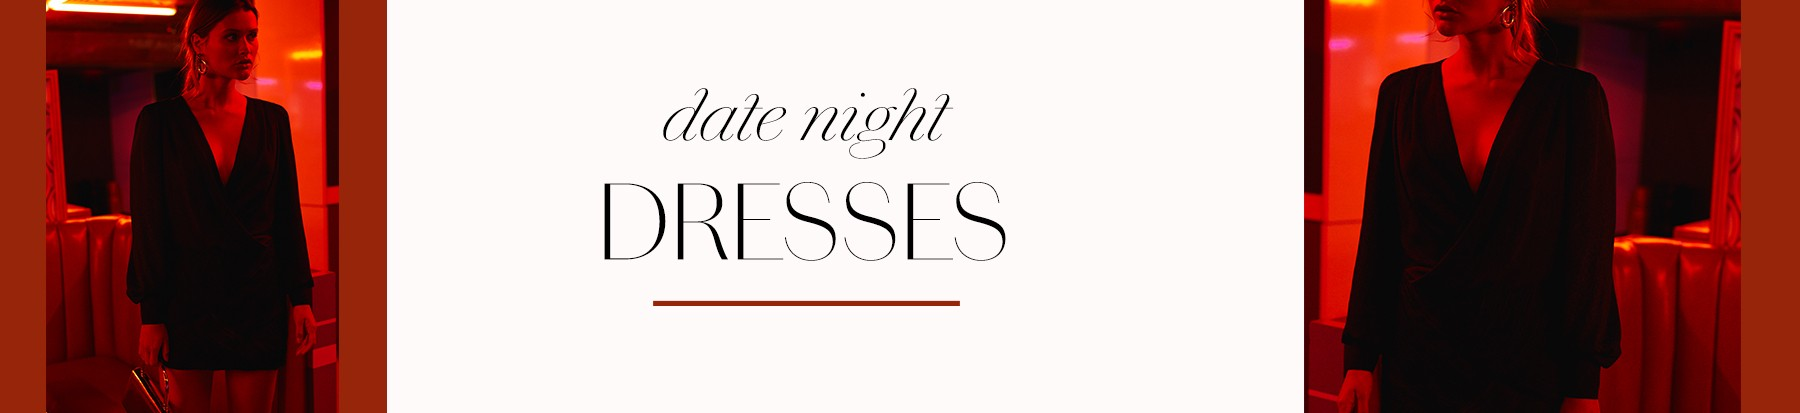 Date Night - Dresses